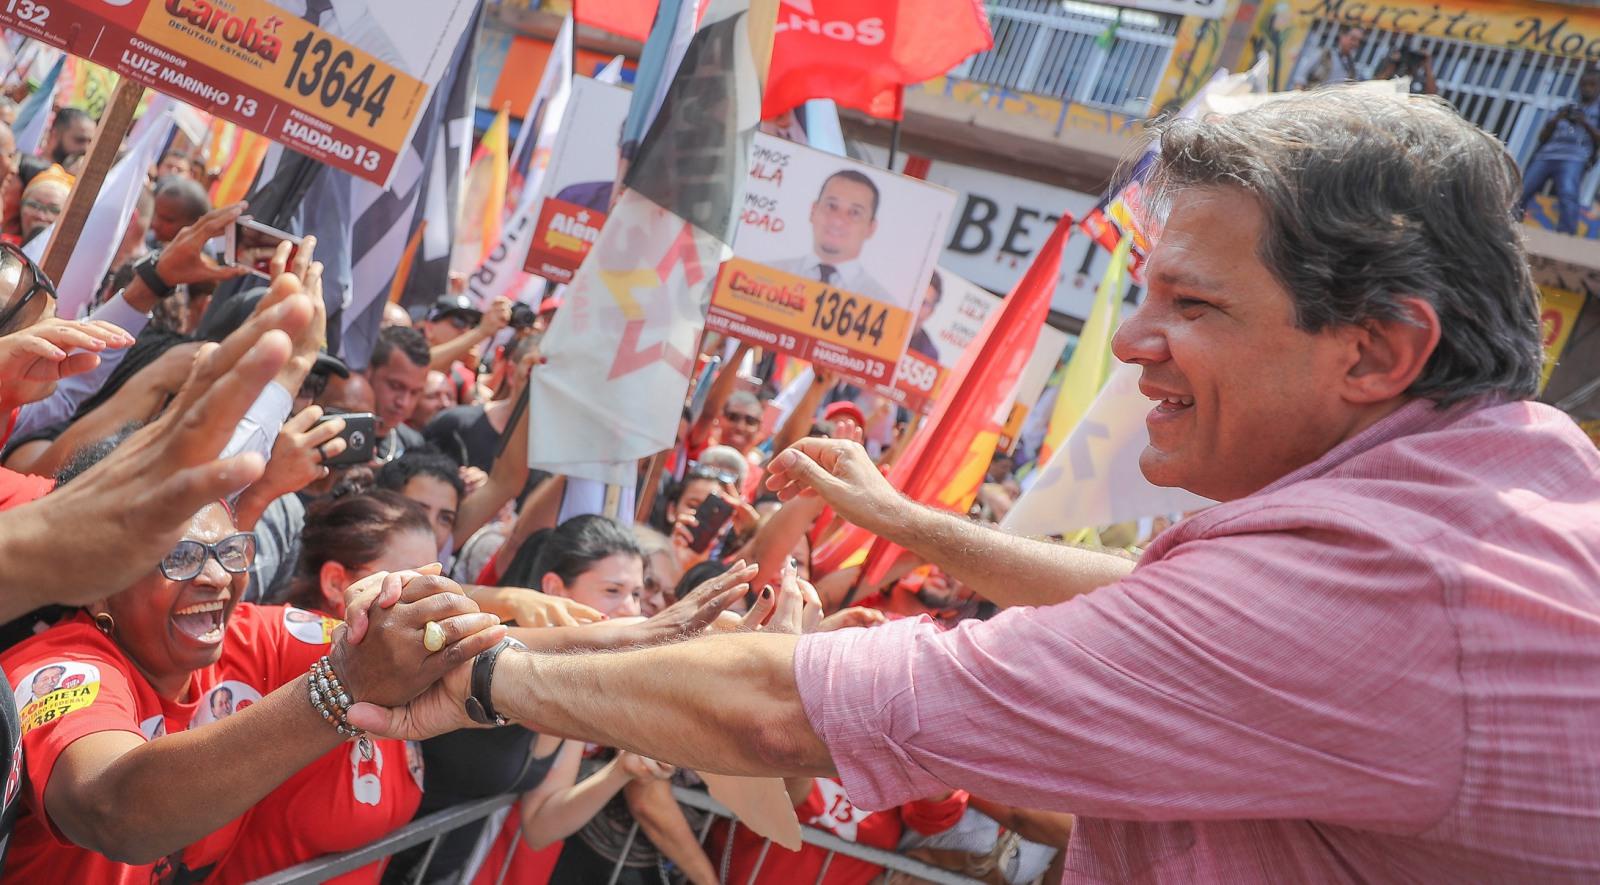 PELA DEMOCRACIA E PELO FUTURO: HADDAD PRESIDENTE